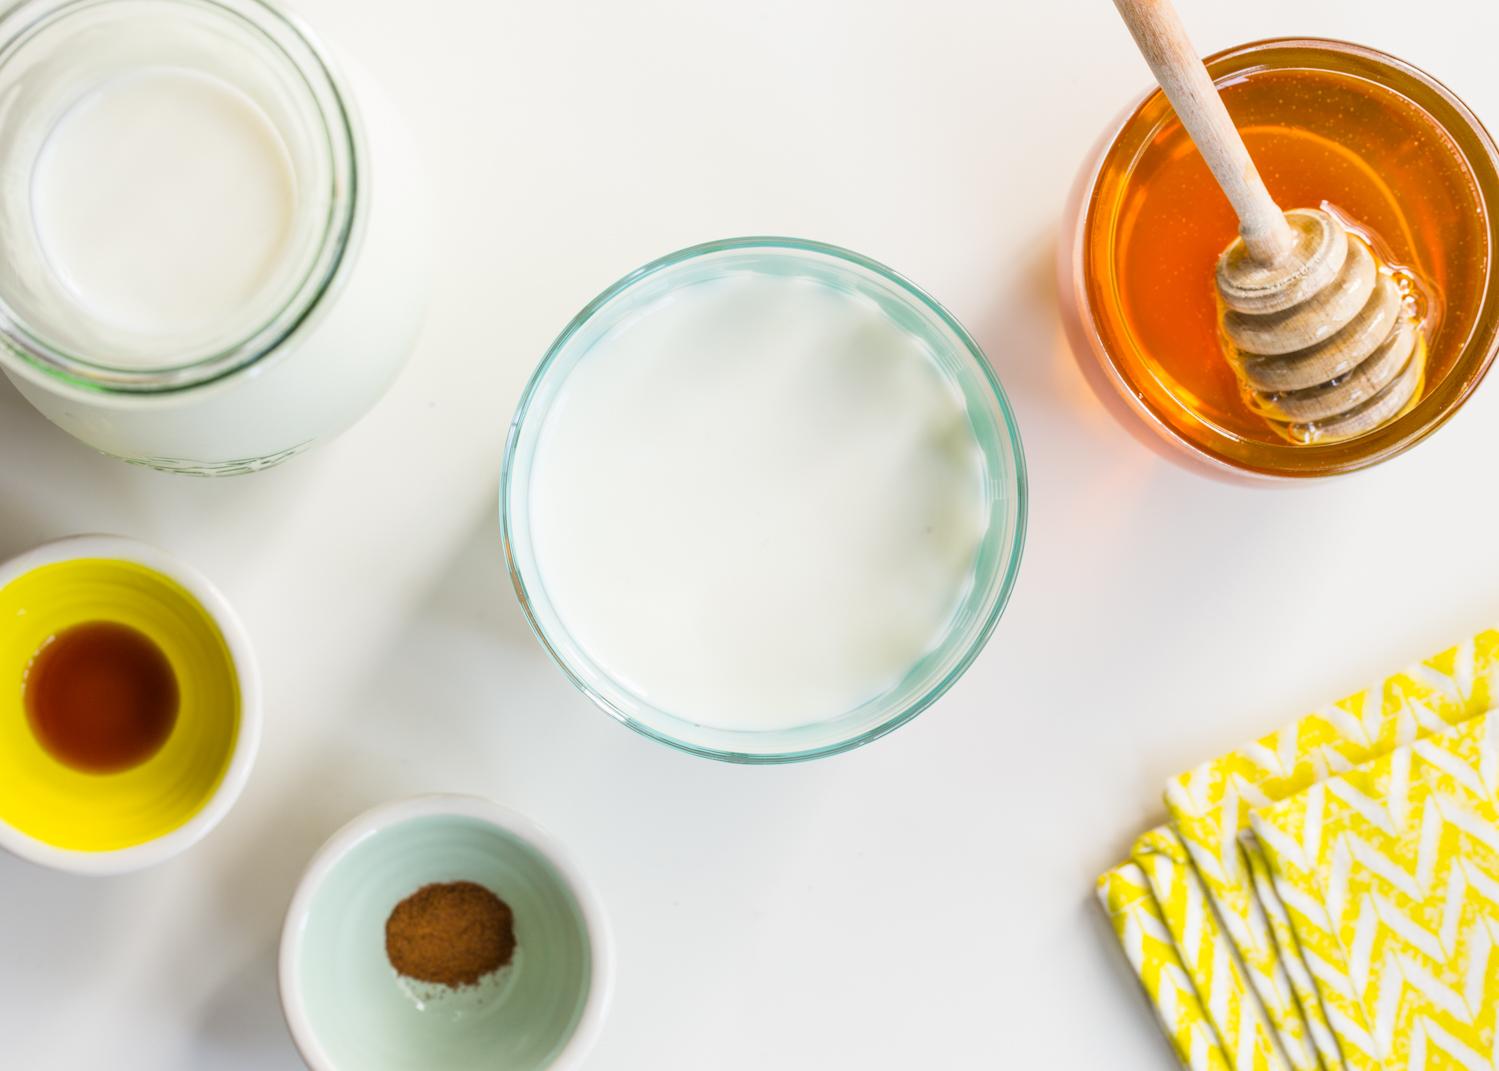 Flavored Milk - Vanilla Cinnamon Milk with honey, cinnamon and vanilla